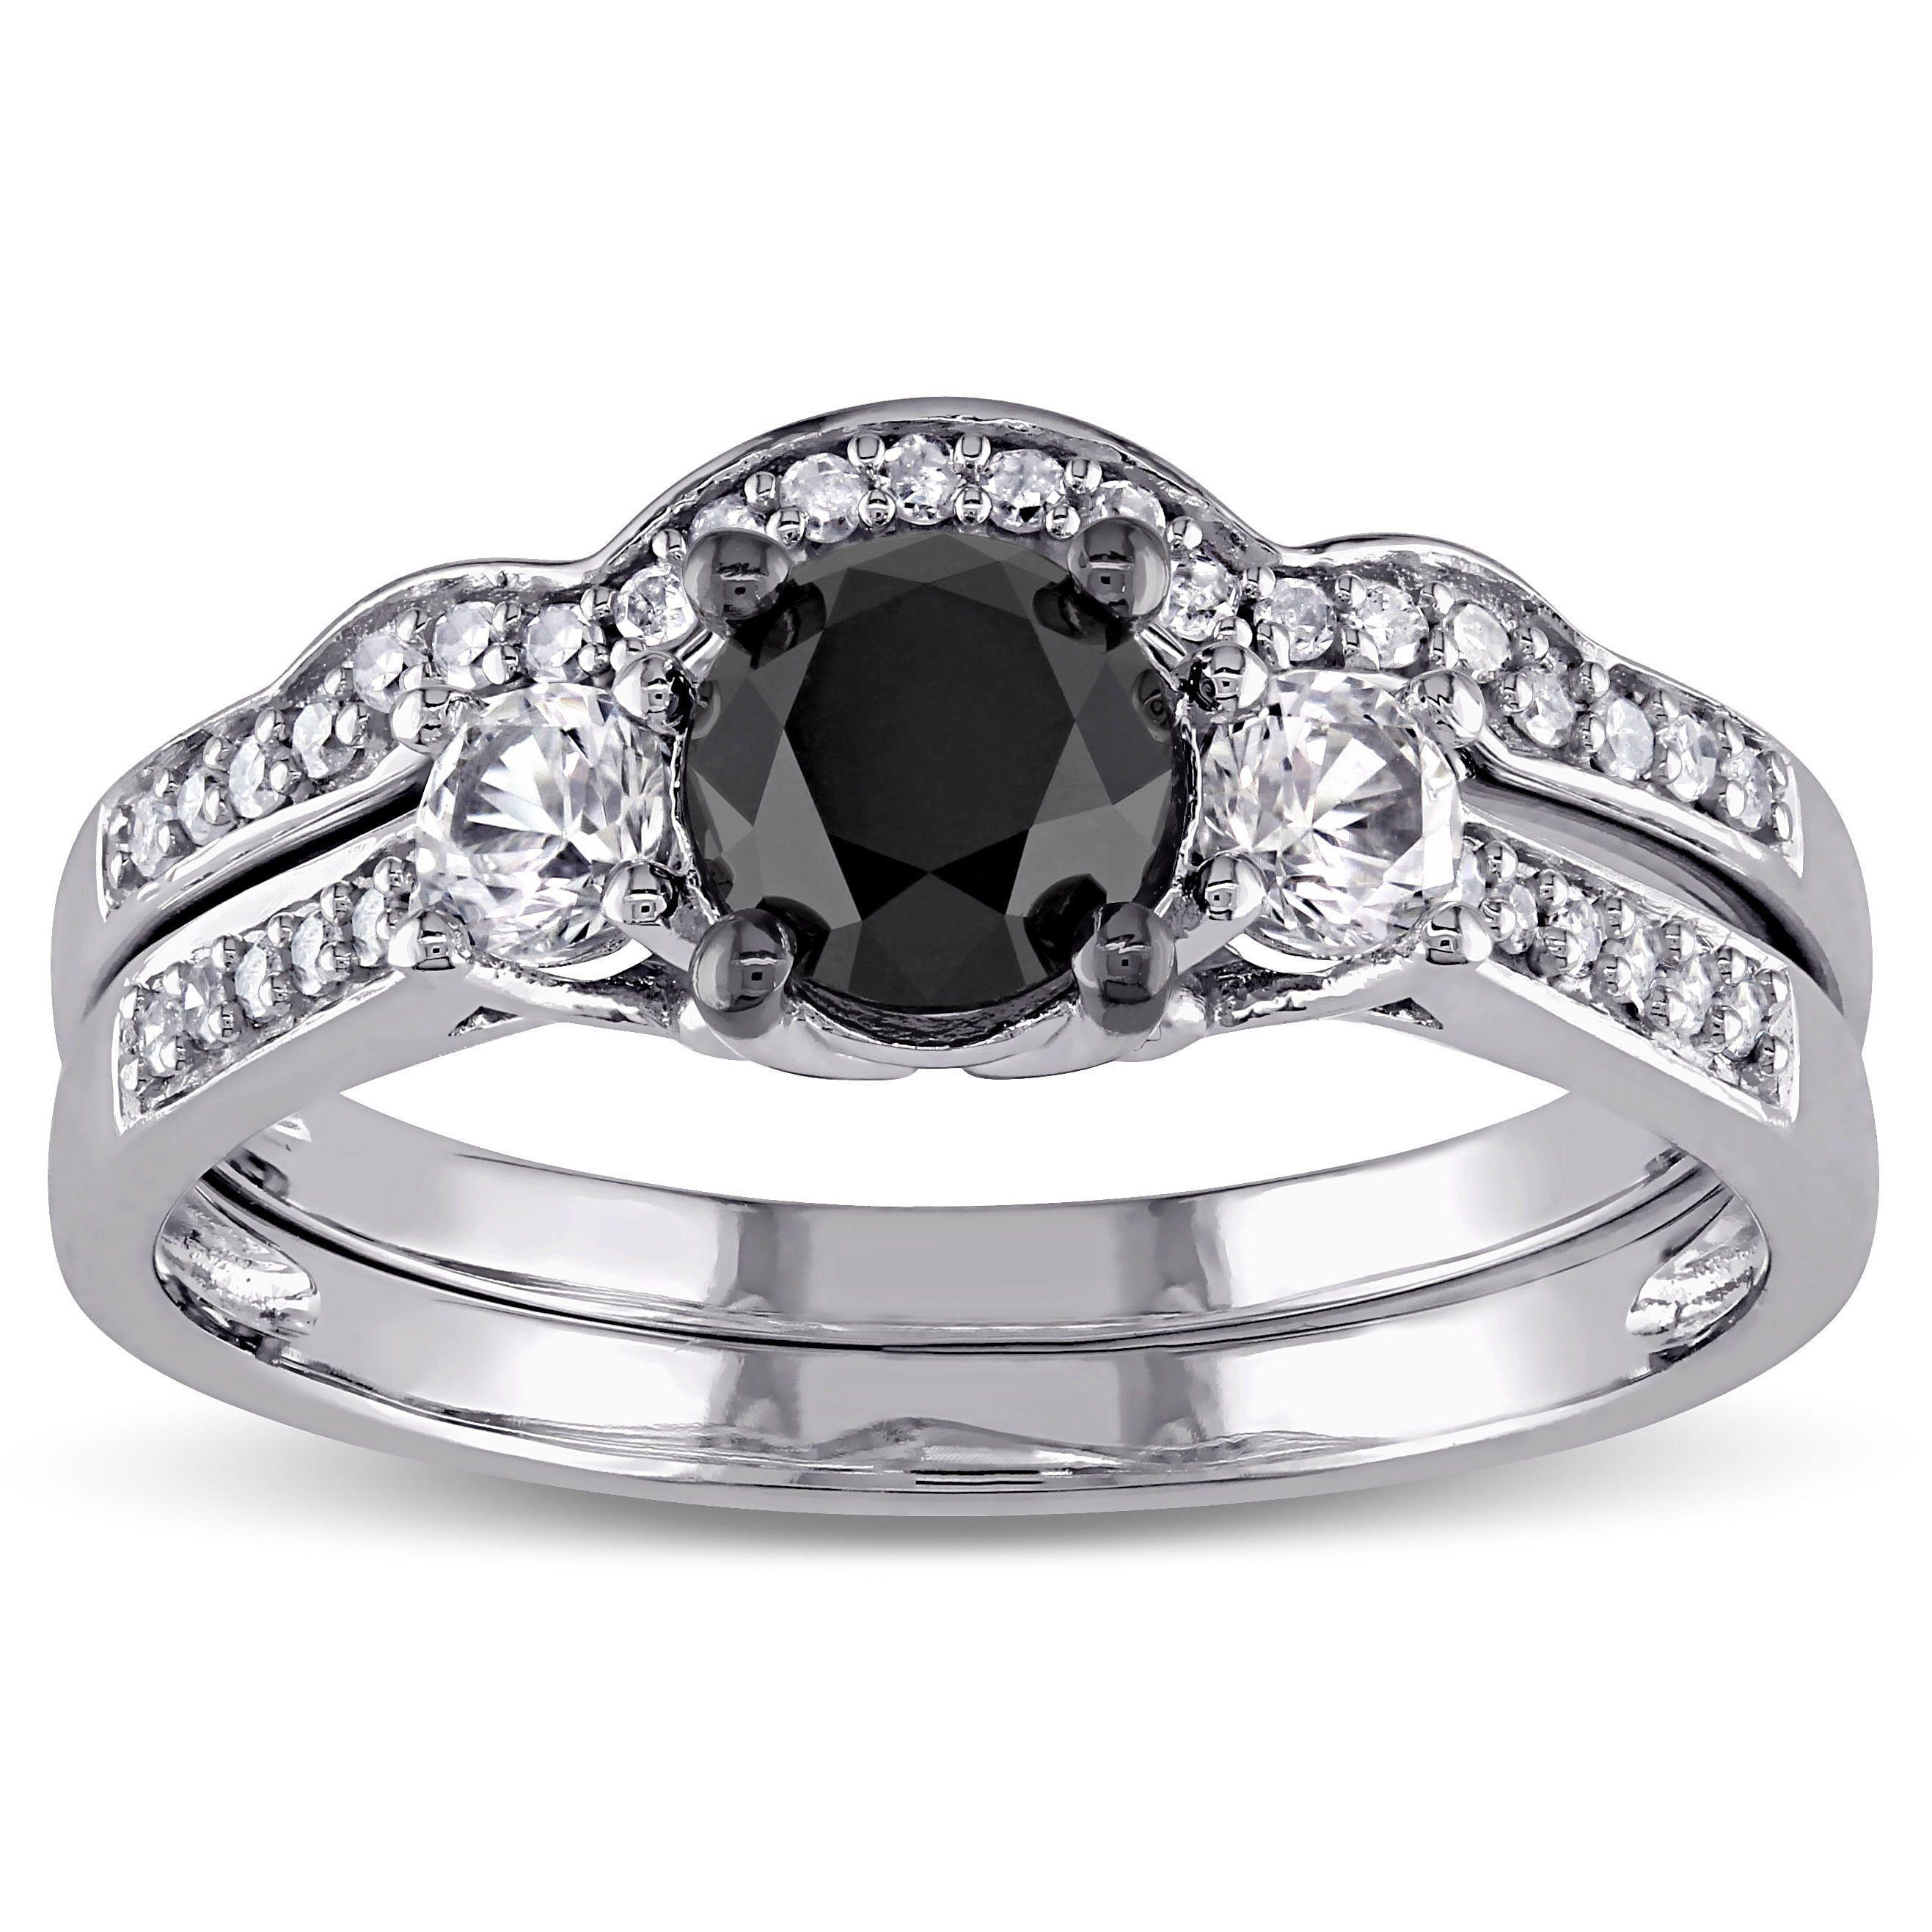 Miadora 10k White Gold Created Shire And 7 8ct Black Diamond Bridal Ring Set G H I2 I3 Size 10